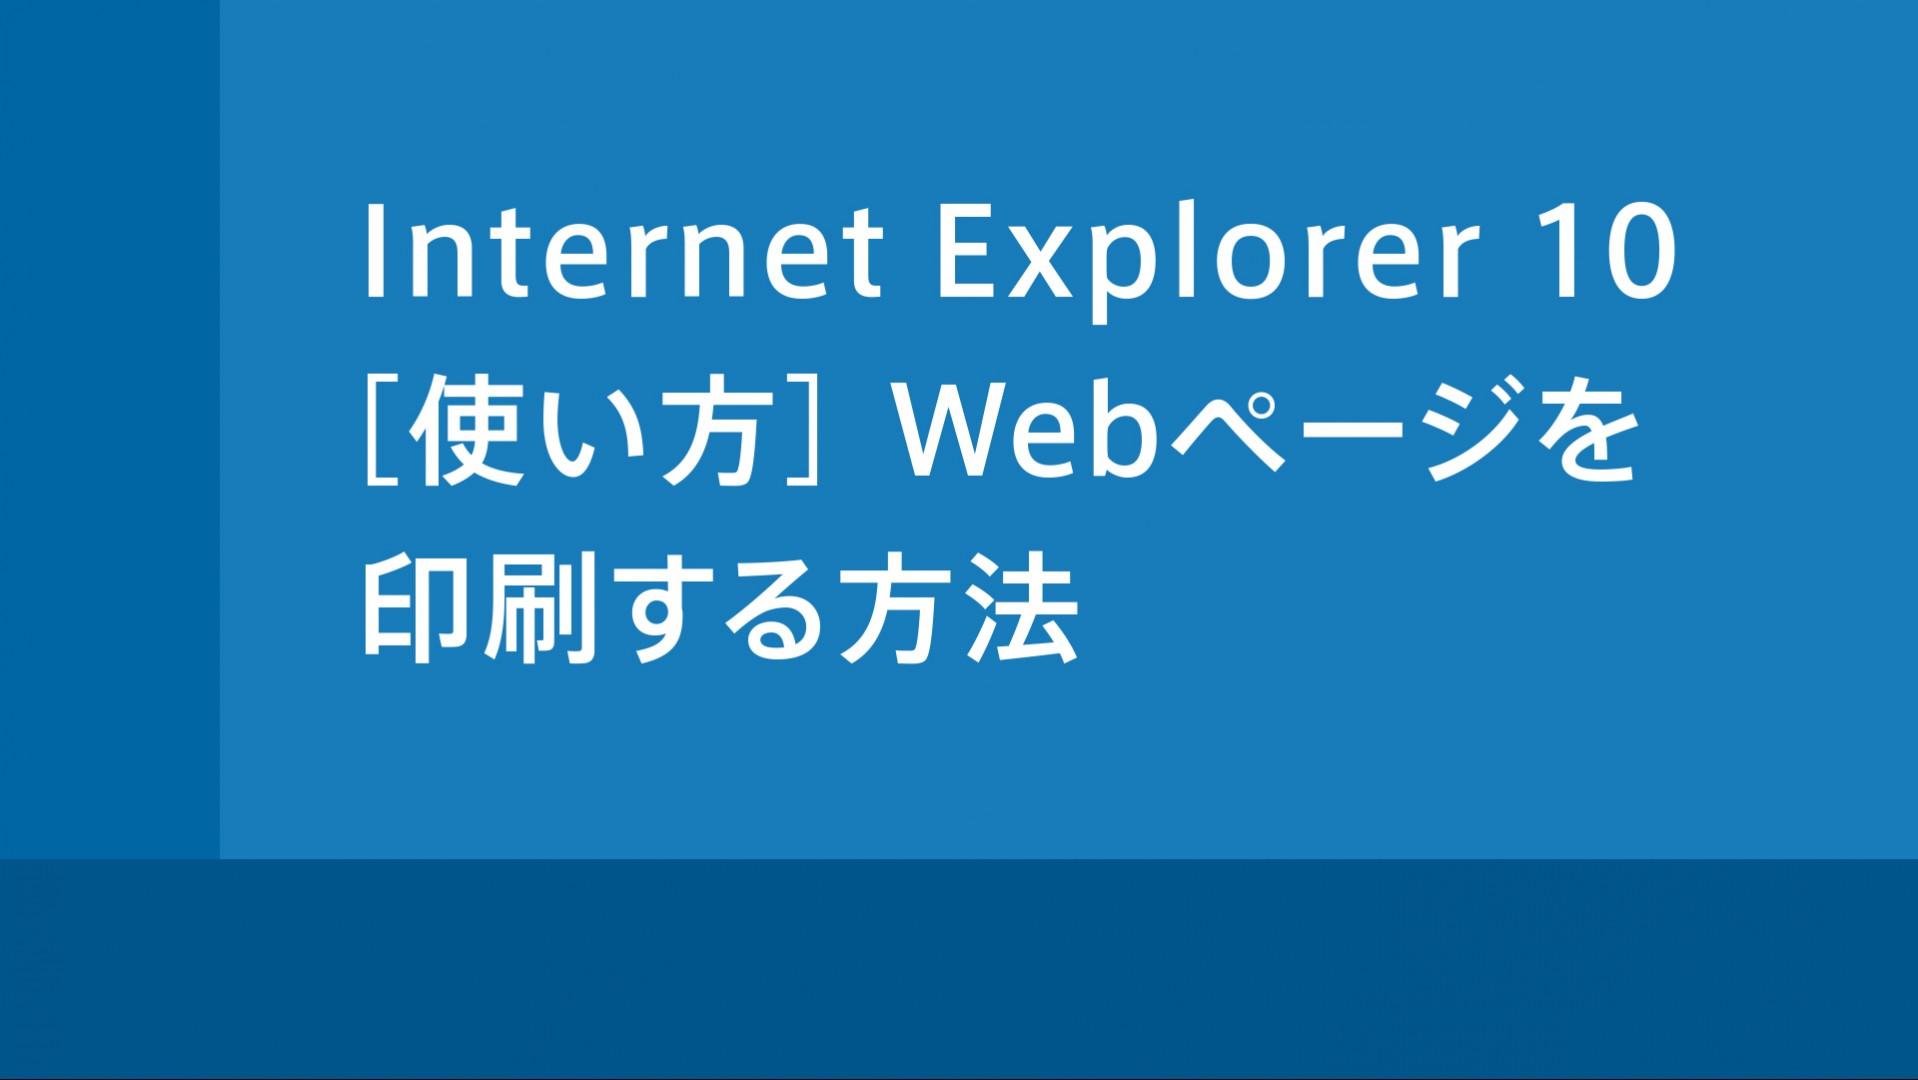 Internet Explorer 10 使い方 Webページを印刷する方法